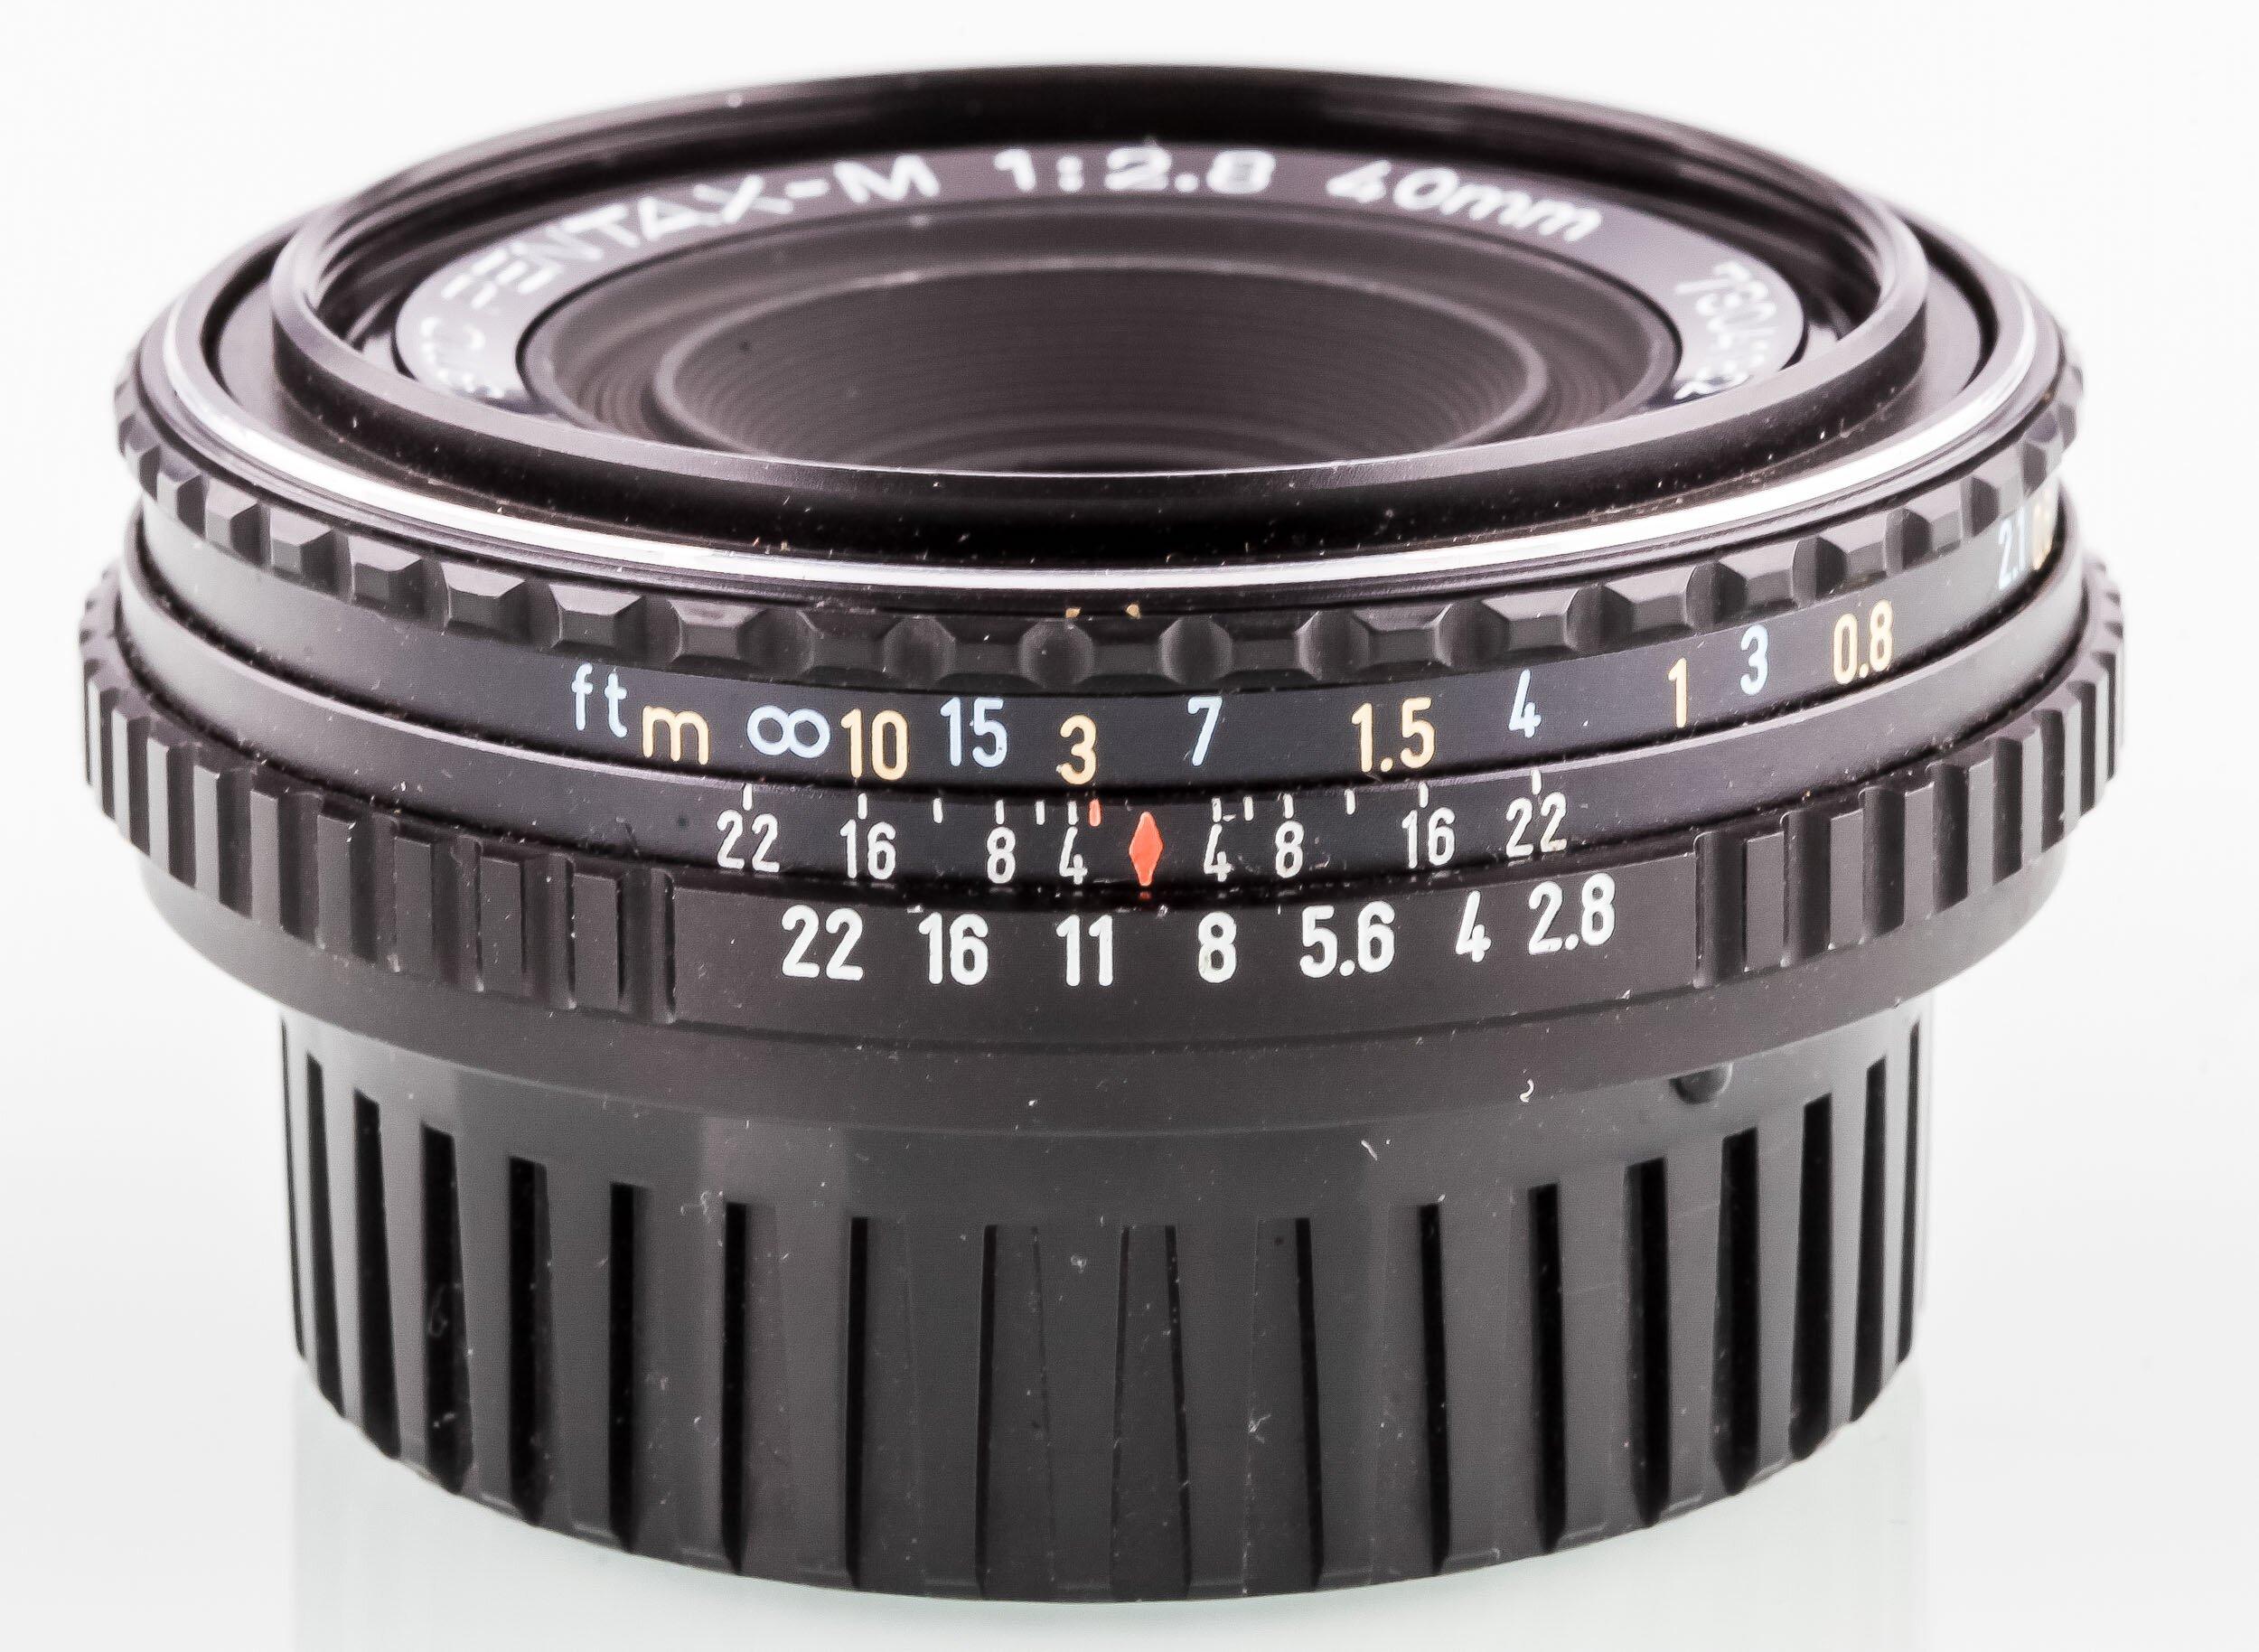 SMC Pentax-M 2,8/40mm PENCAKE